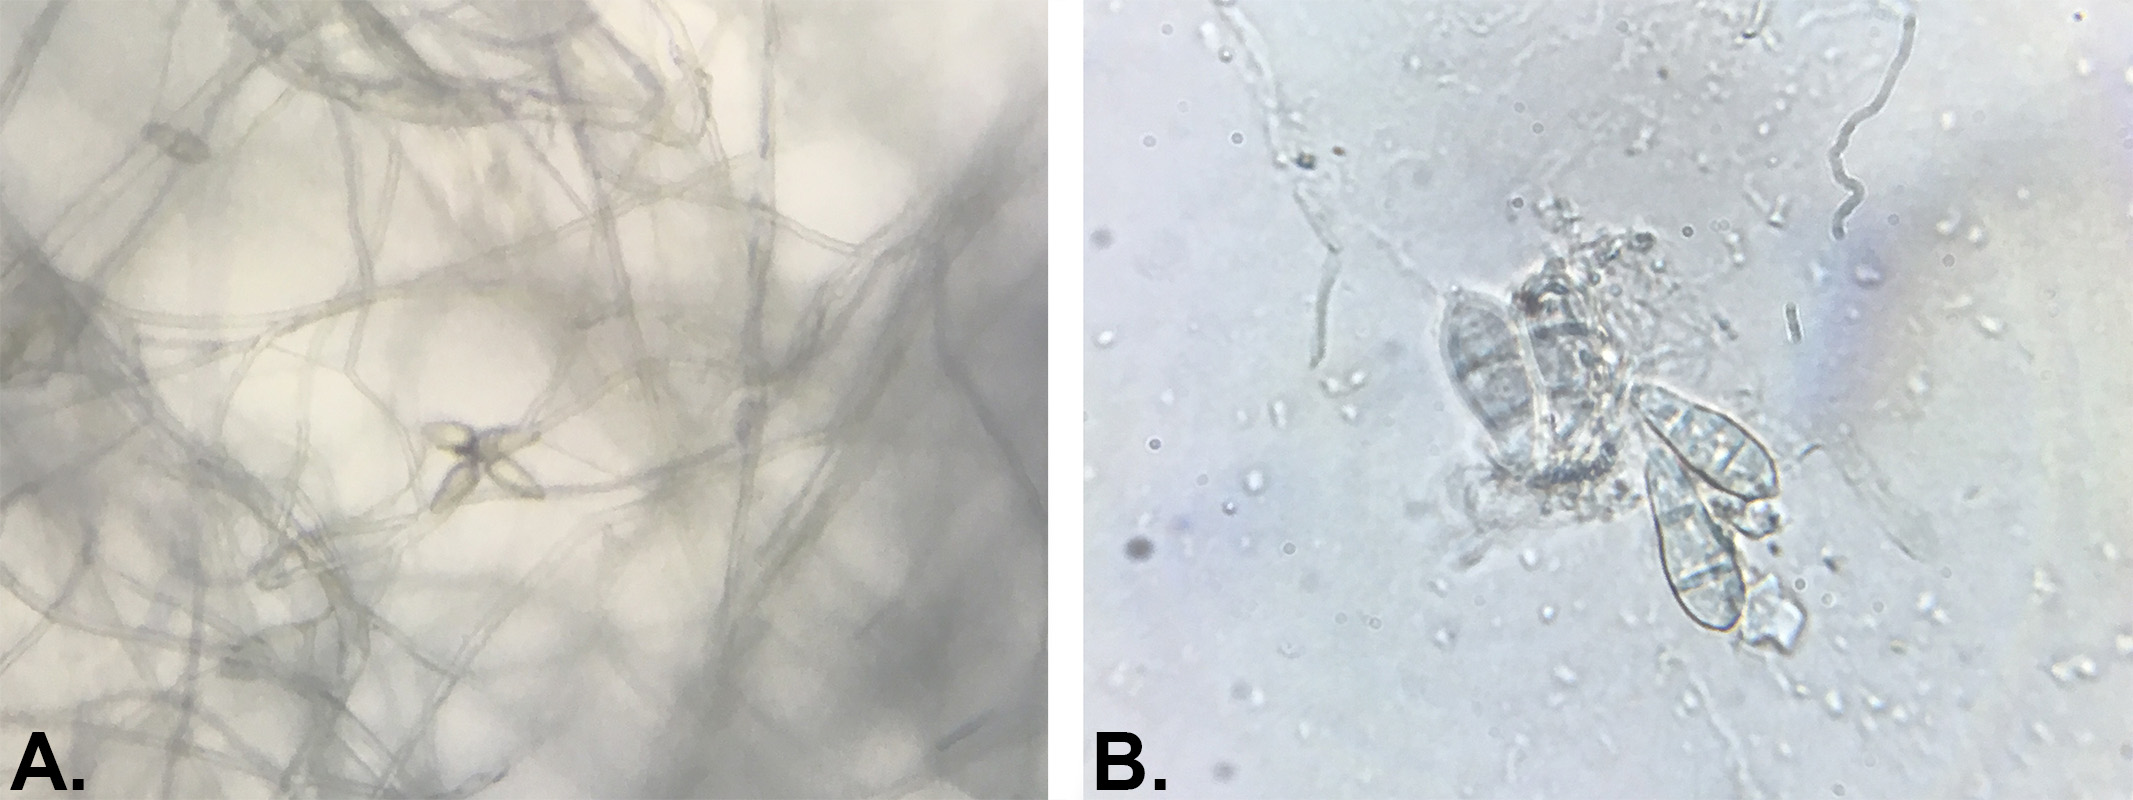 Culture de Magnaporthe Grisea isolée sur milieu gélosé PDA au microscope